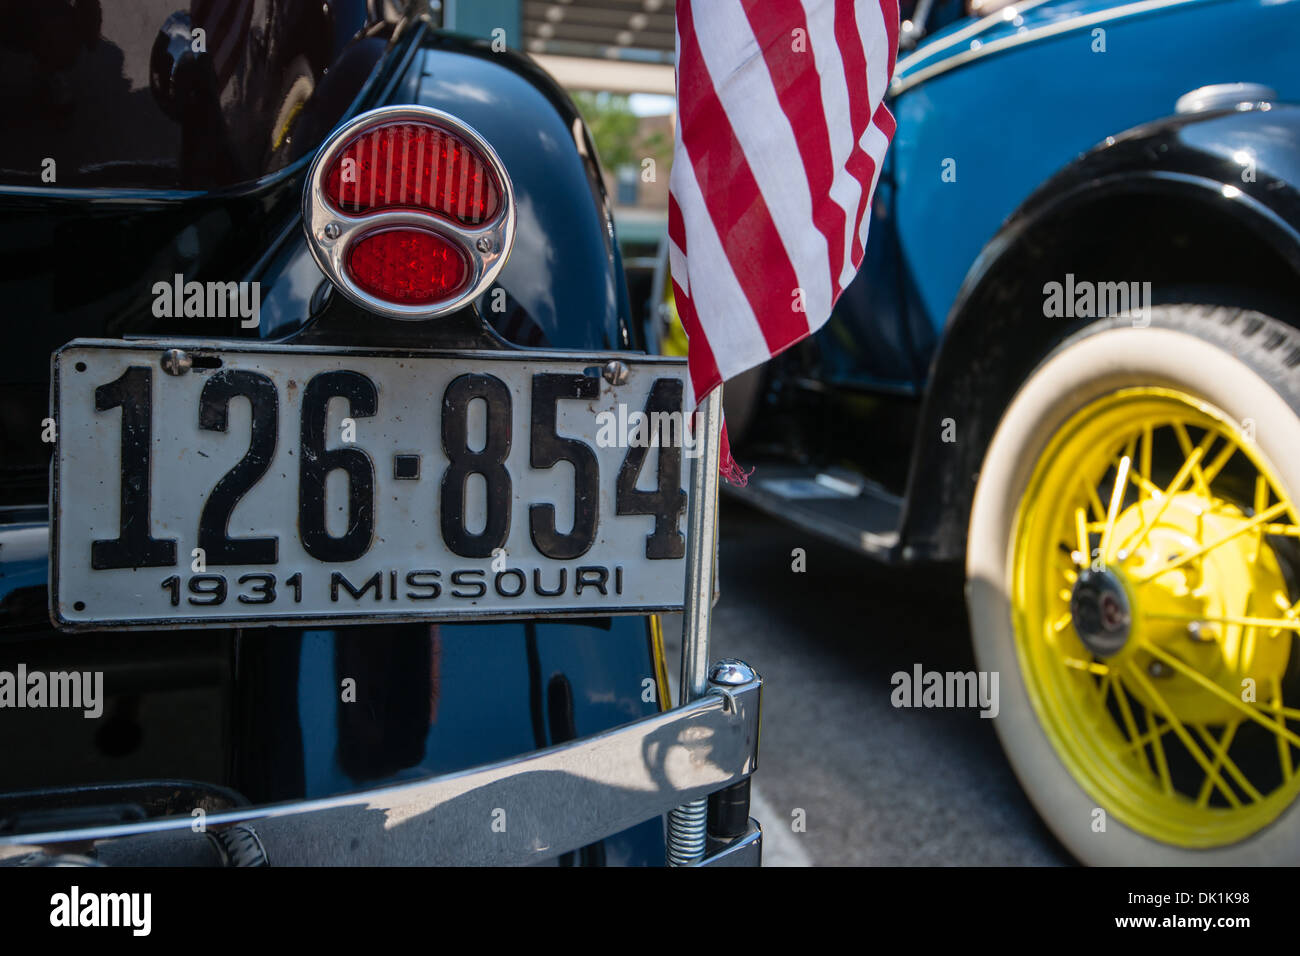 Missouri License Plate Stock Photos & Missouri License Plate Stock ...